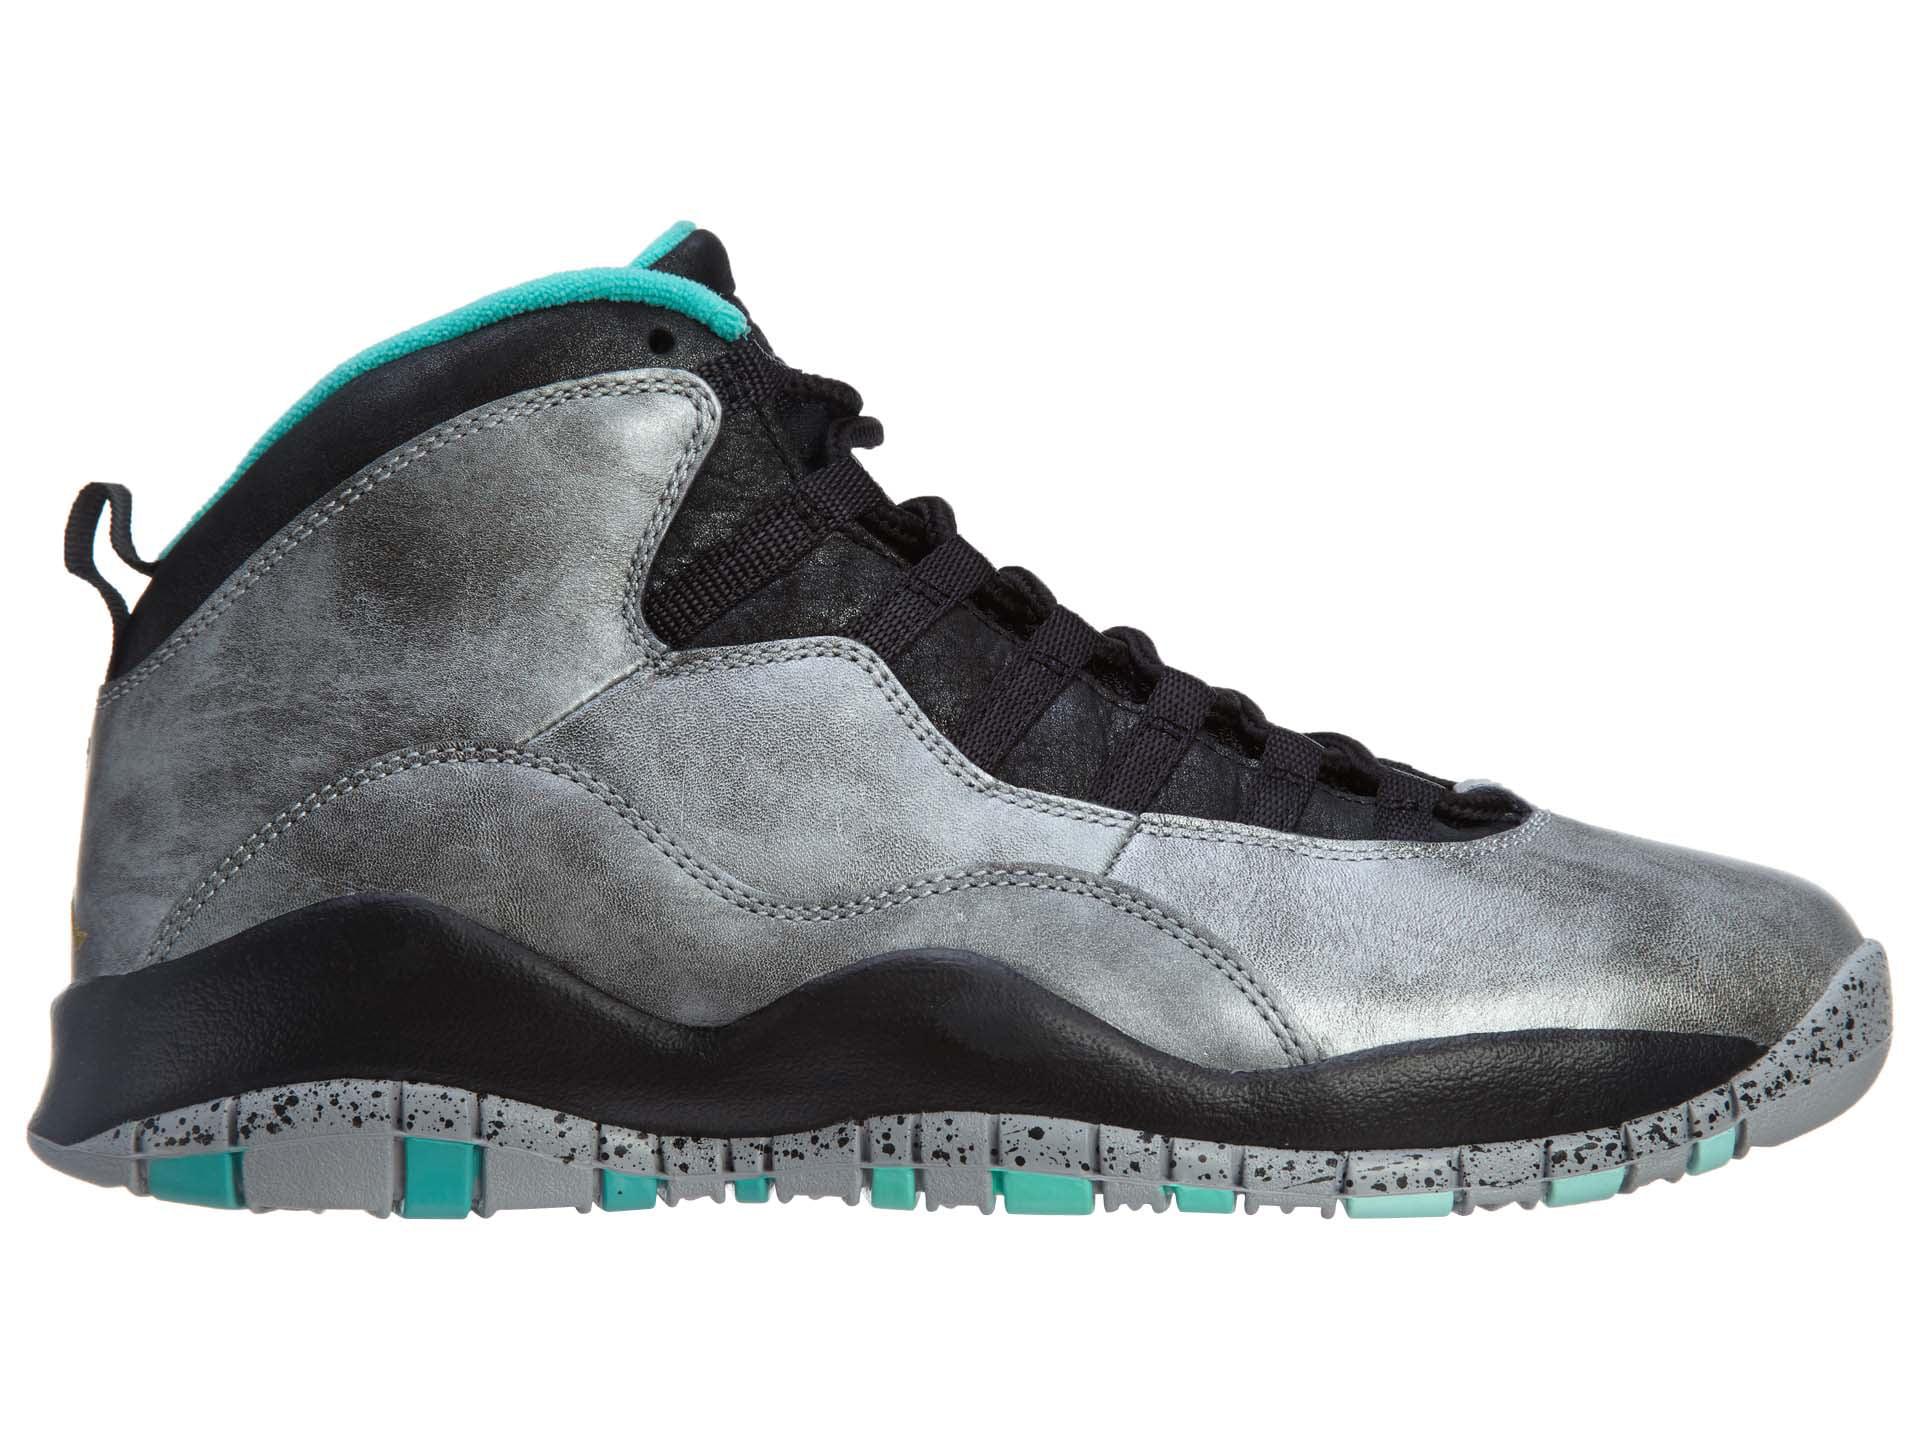 Jordan 10 Retro 30th Mens Style : 705178